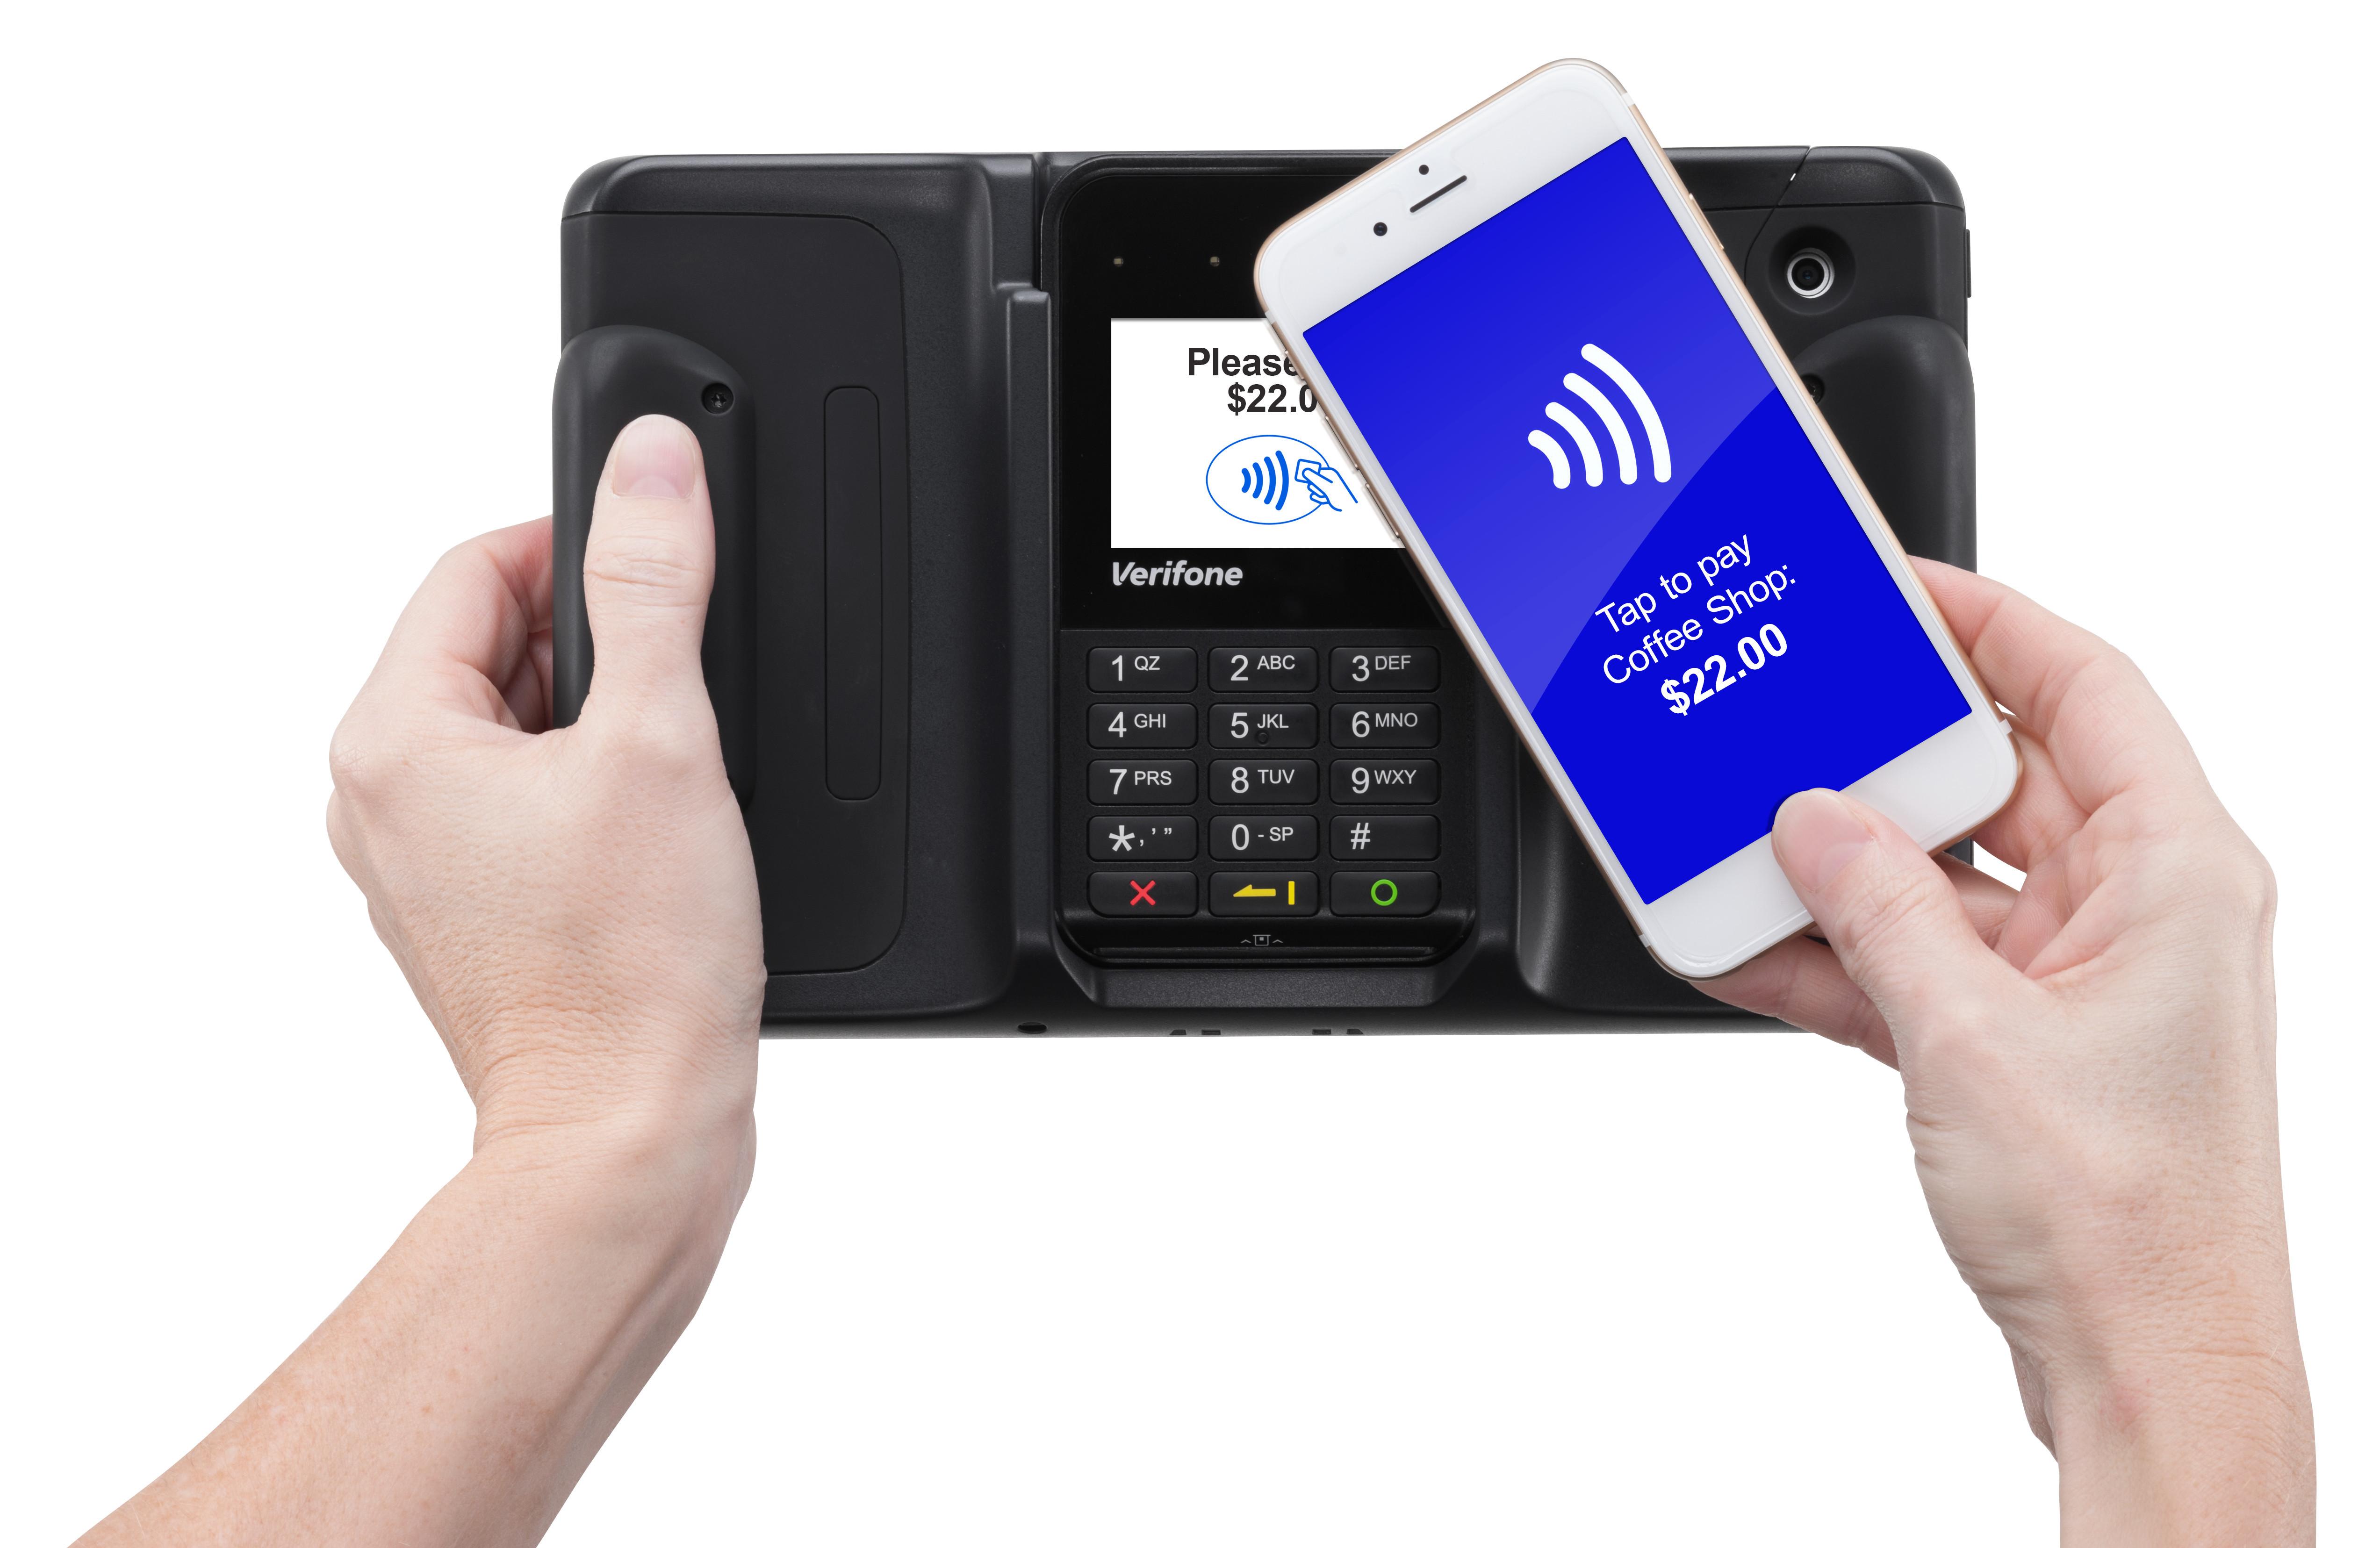 Verifone Offers Merchants A Single Mpos Payment Terminal